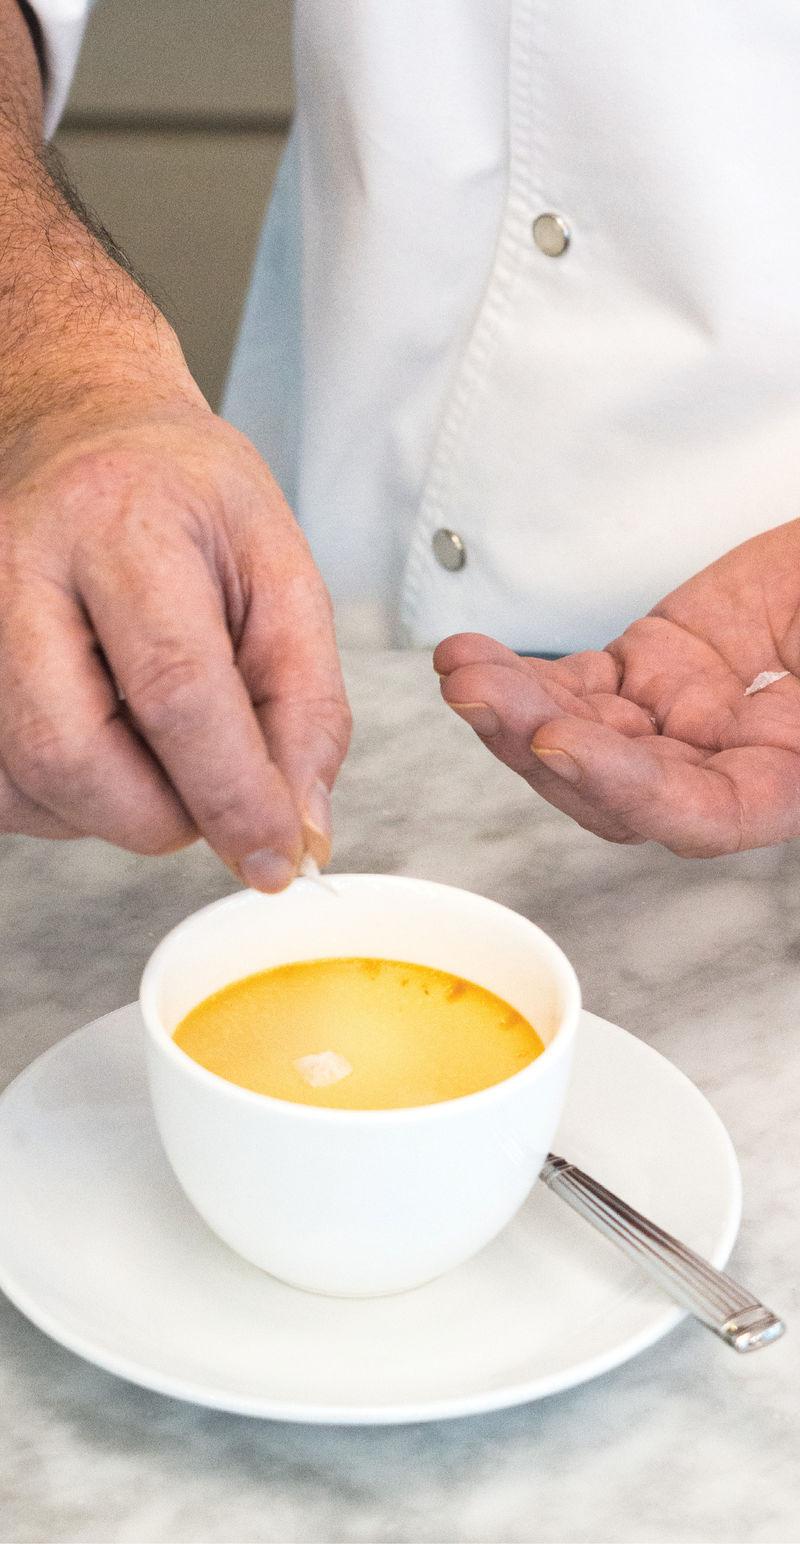 Finishing Touch: Chef Fünfrock uses Maldon flake salt to garnish his pot de crèmes.